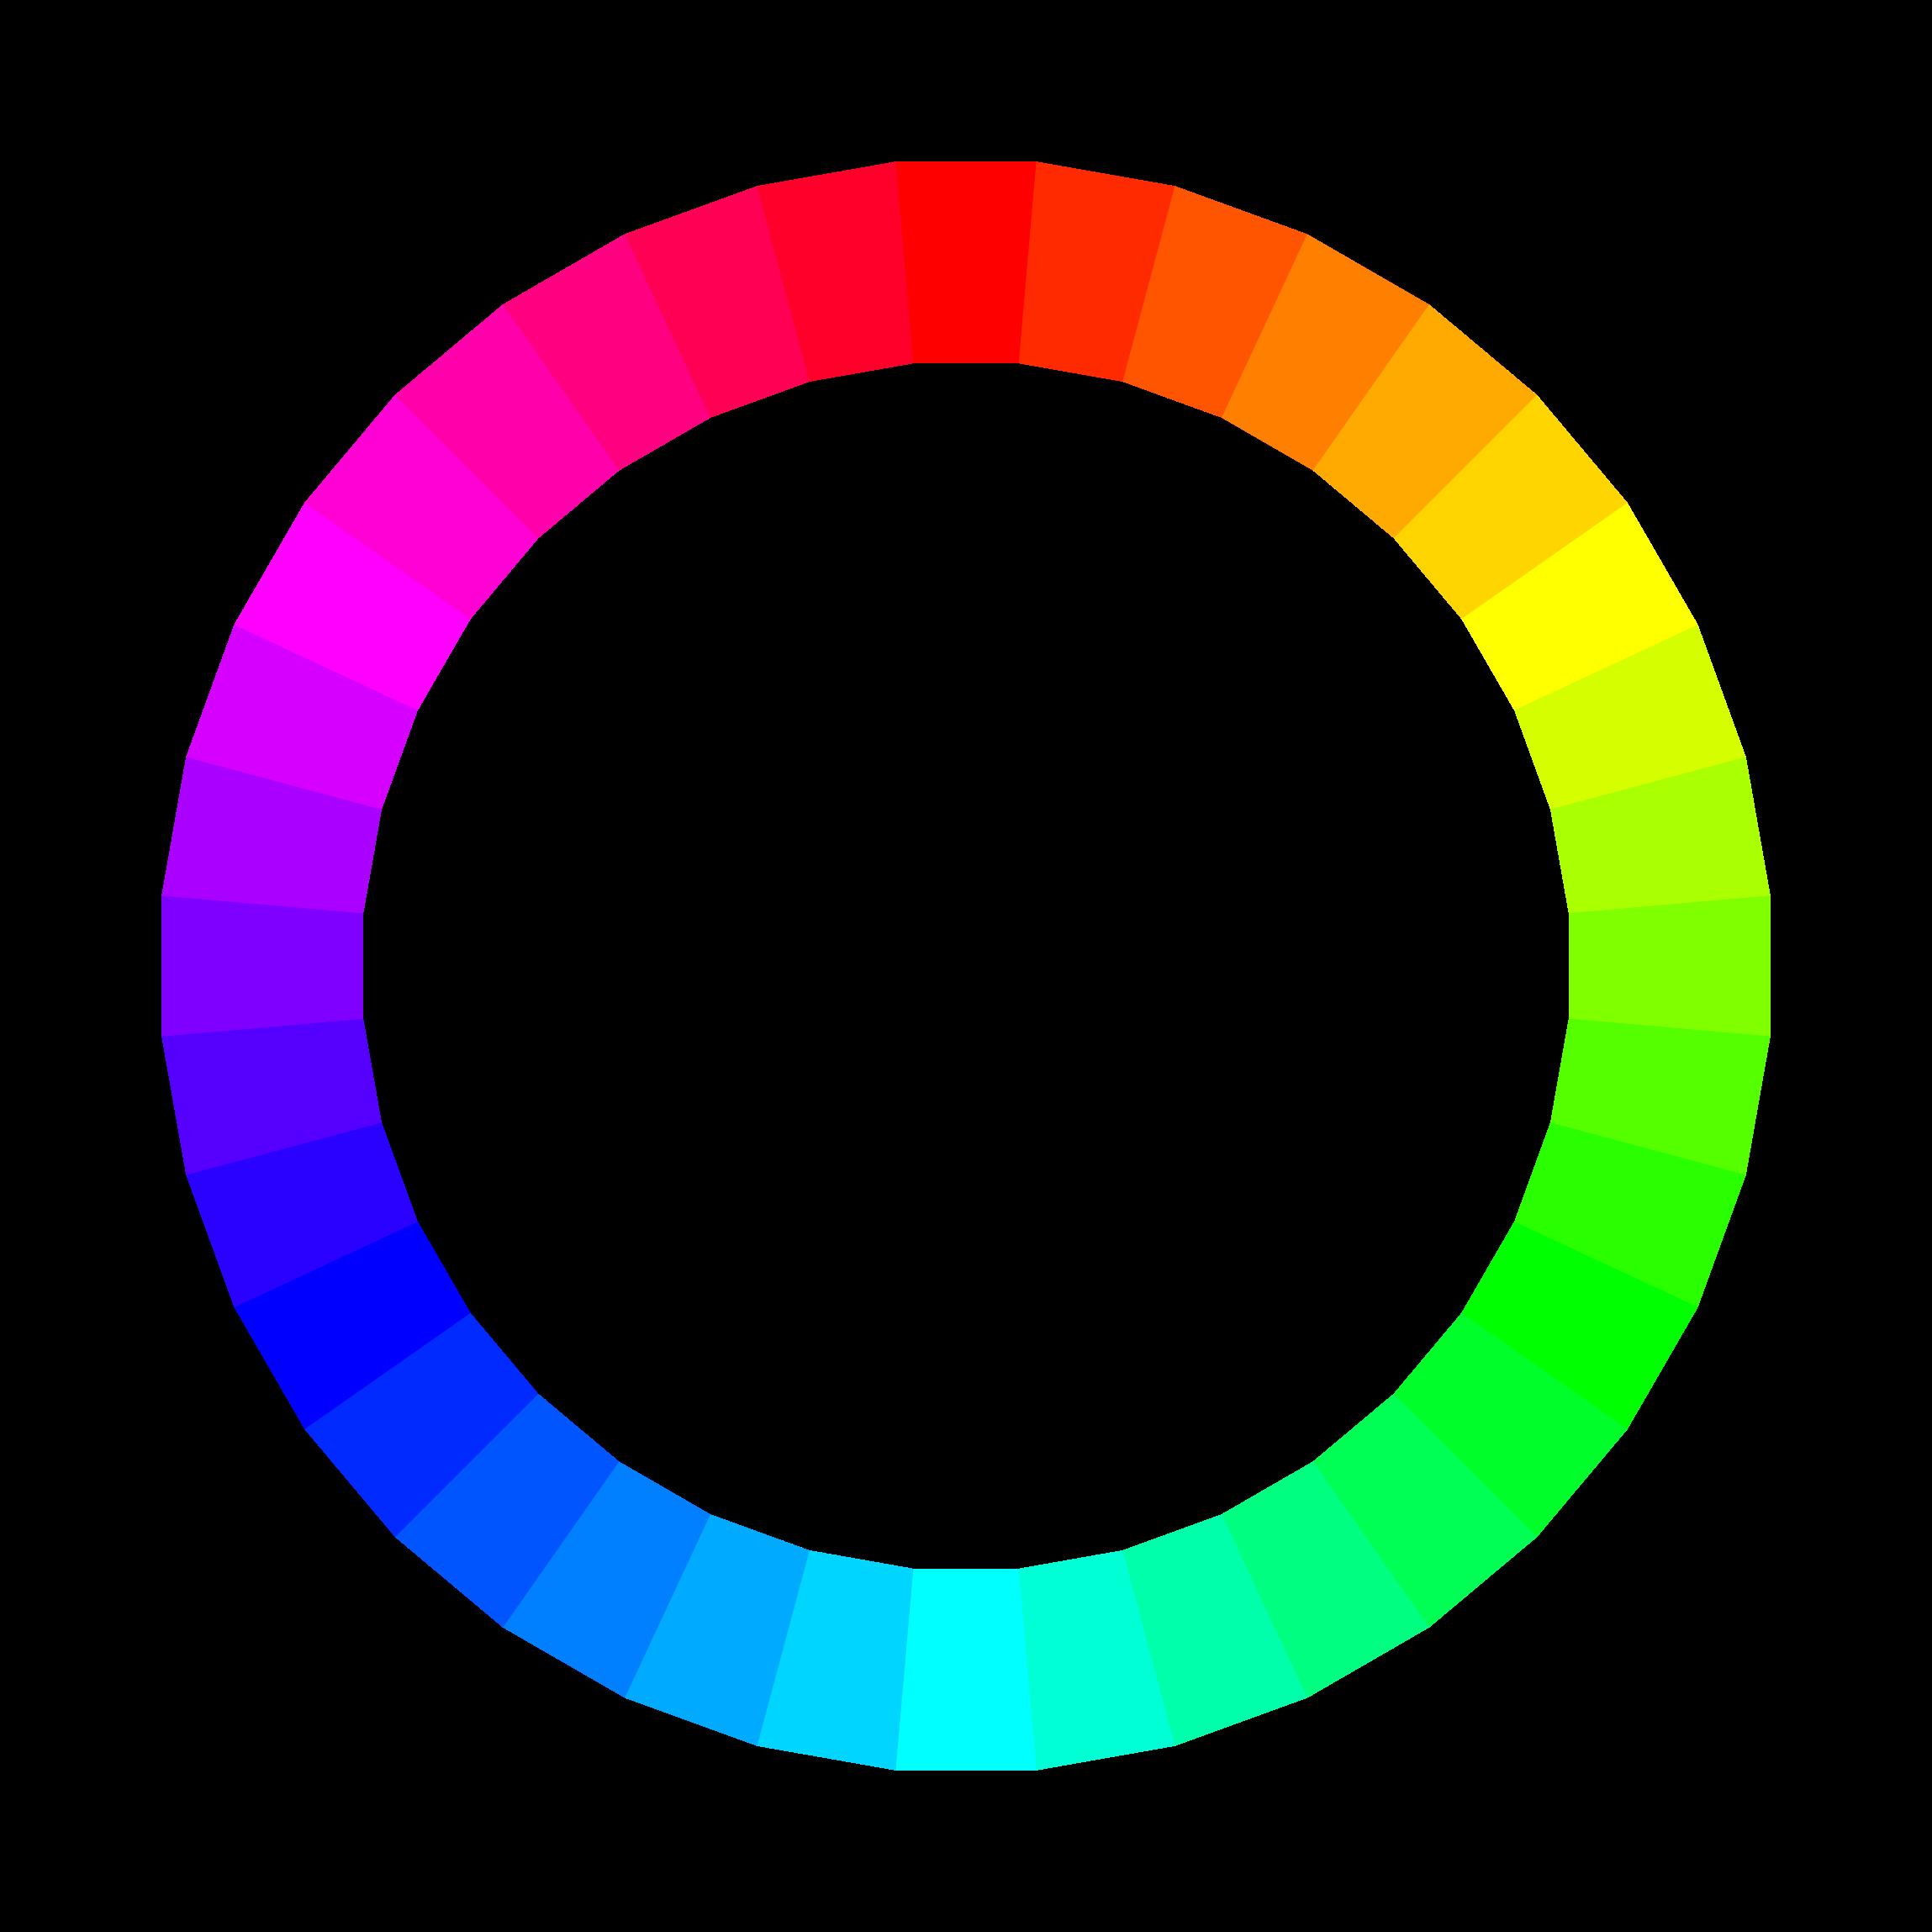 Chromatic circle clipart - Clipground